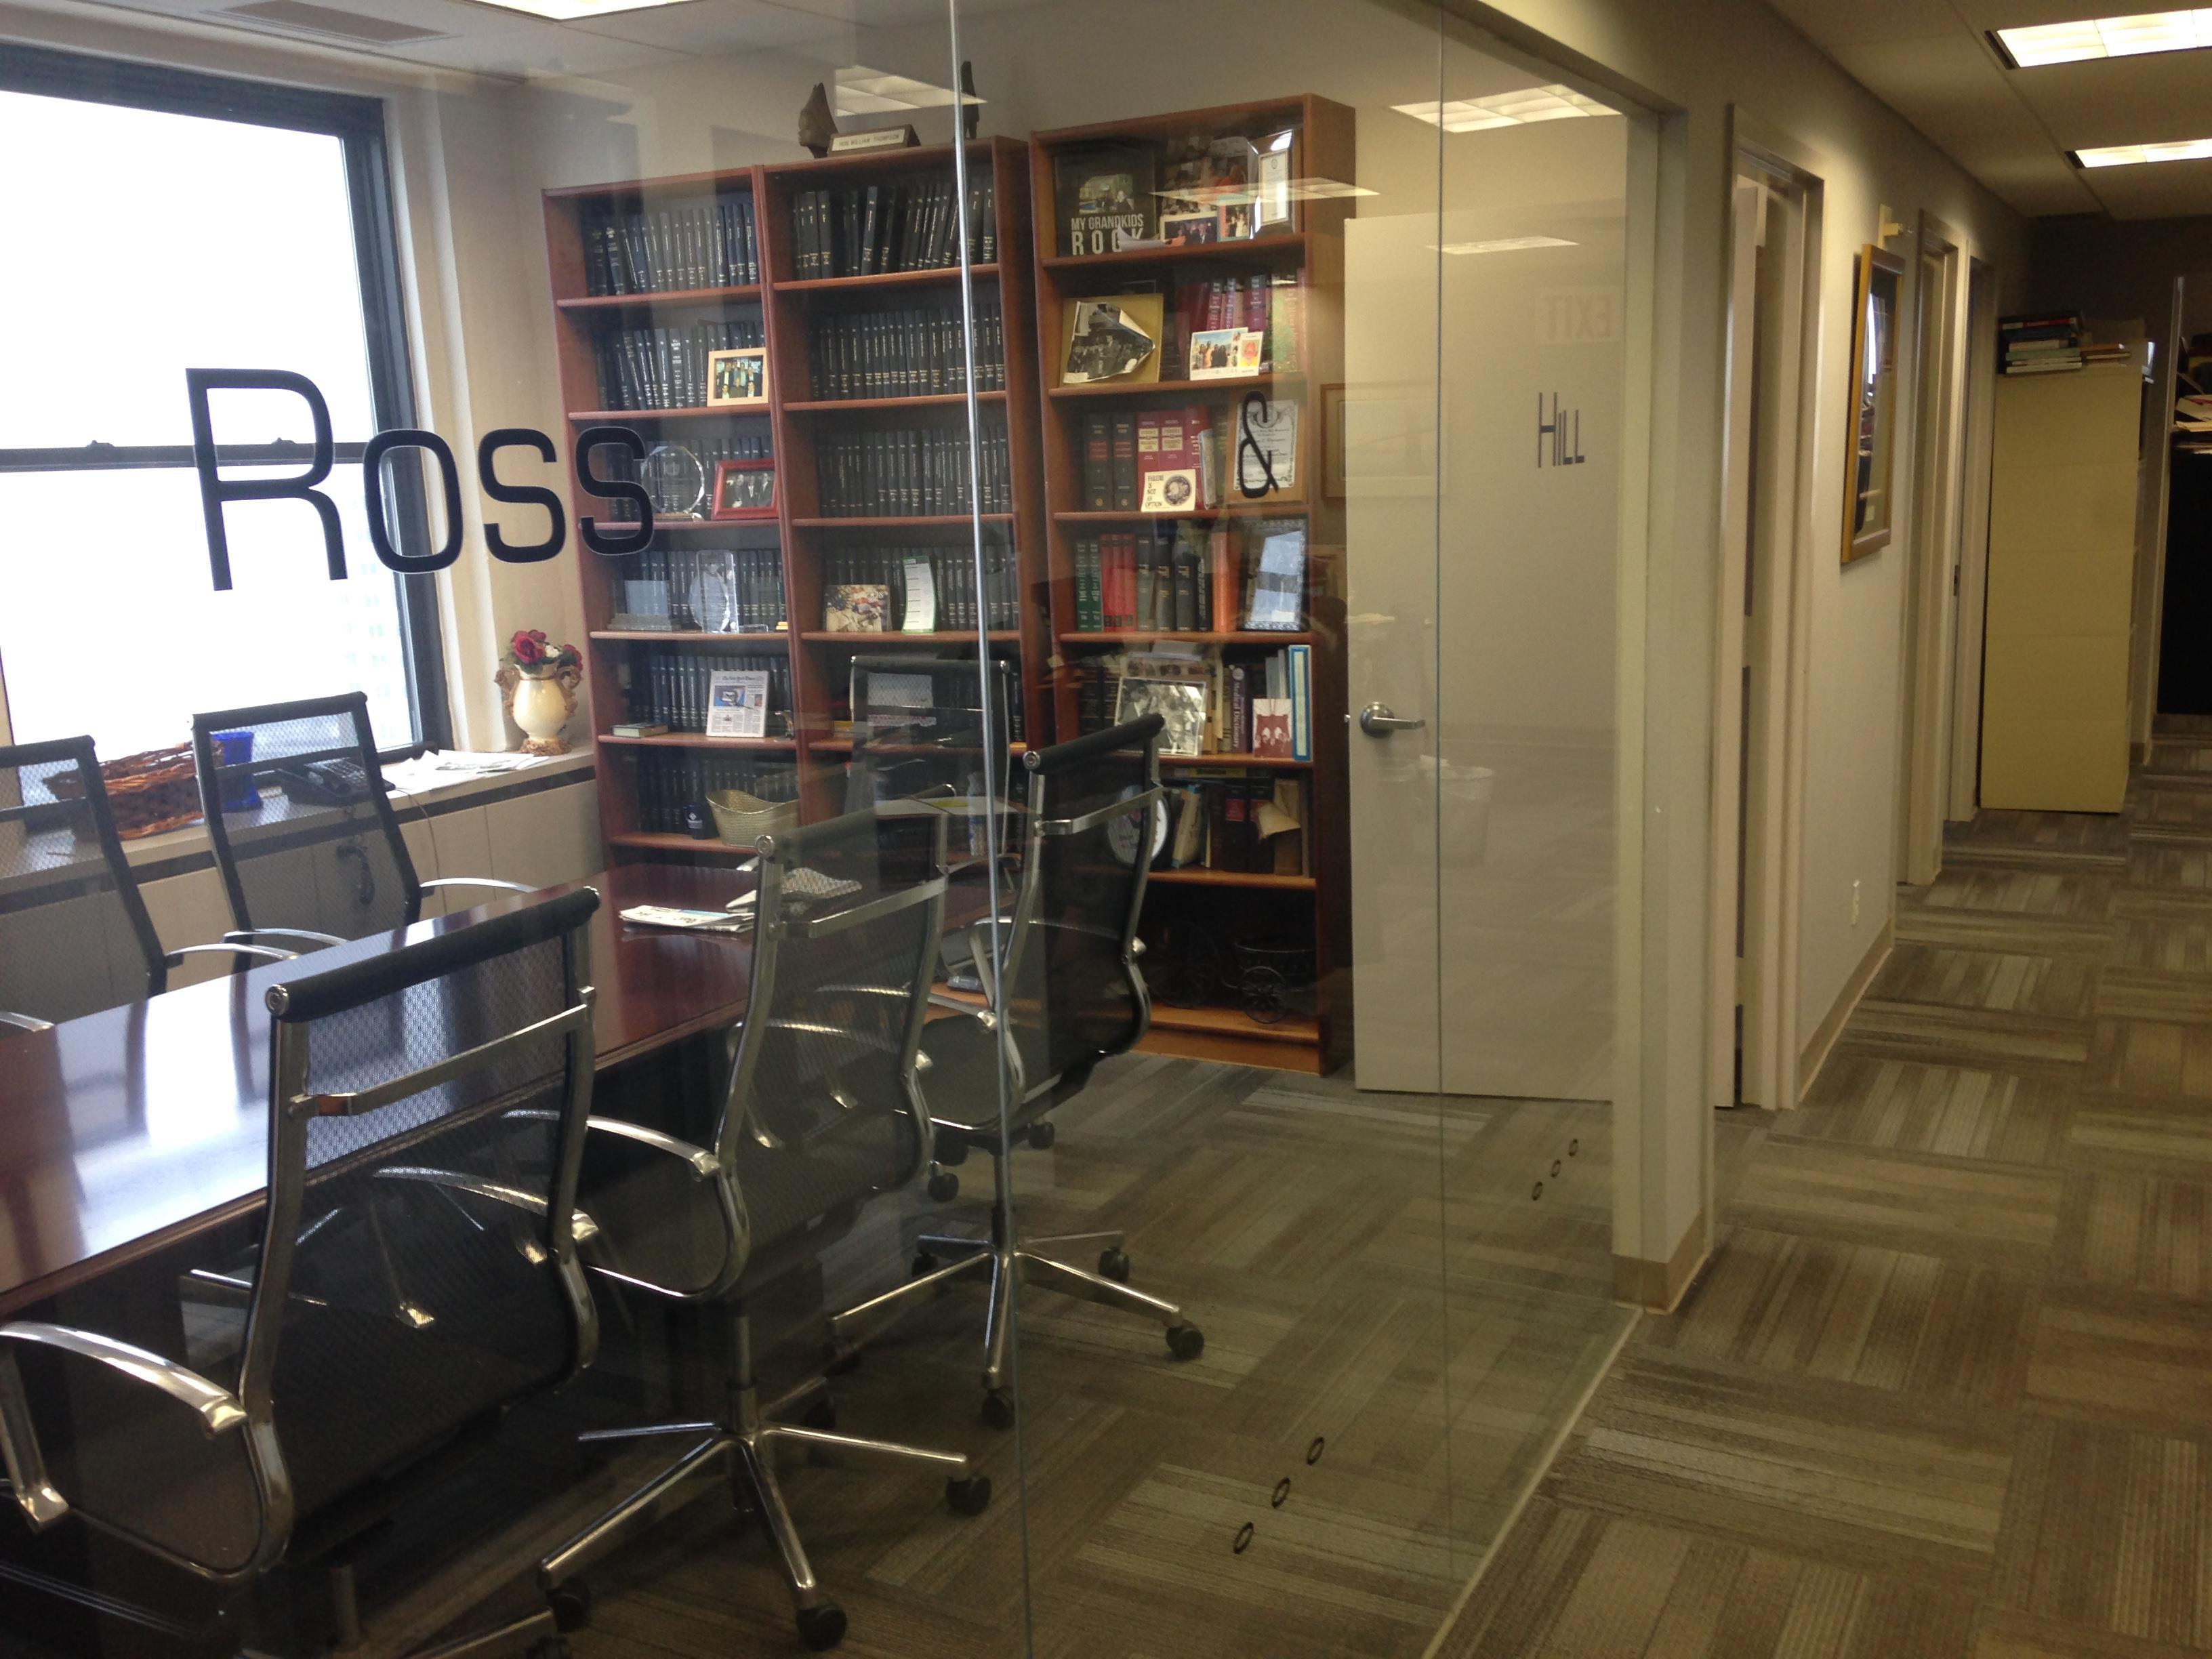 Ross & Hill - Dedicated Desk 1